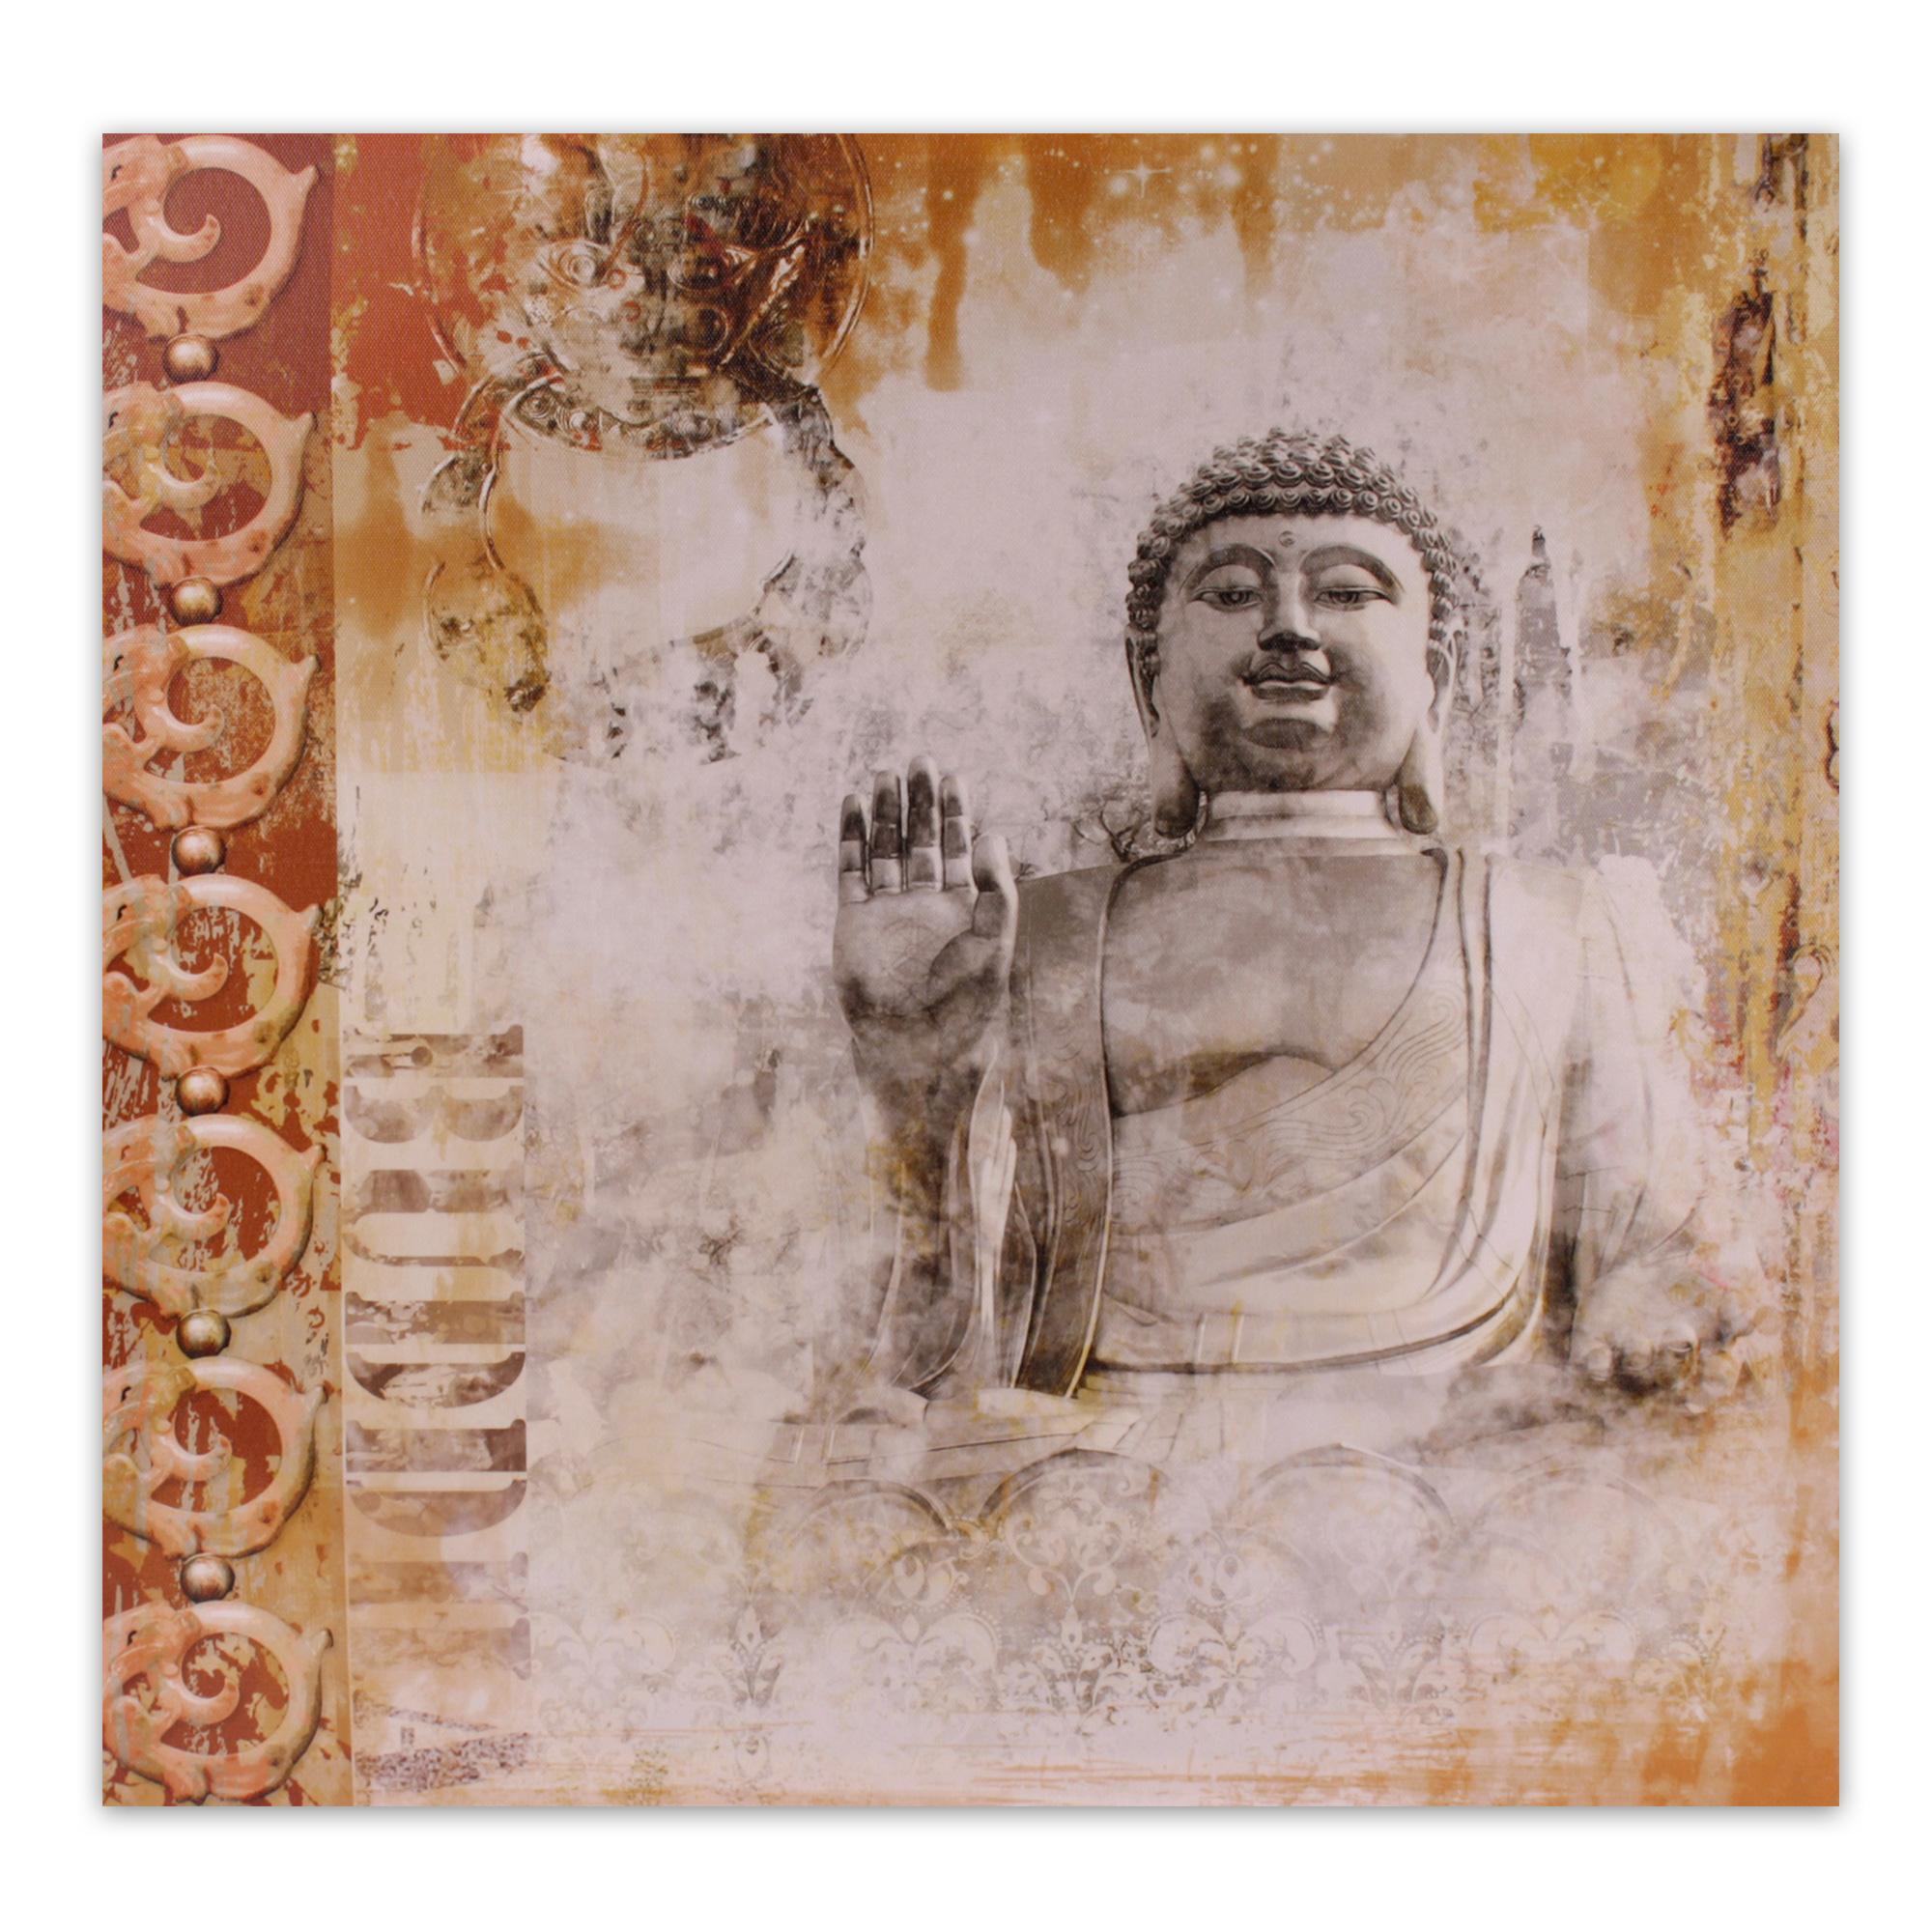 kunstdruck buddha leinwand bild keilrahmen esoterik m nch. Black Bedroom Furniture Sets. Home Design Ideas